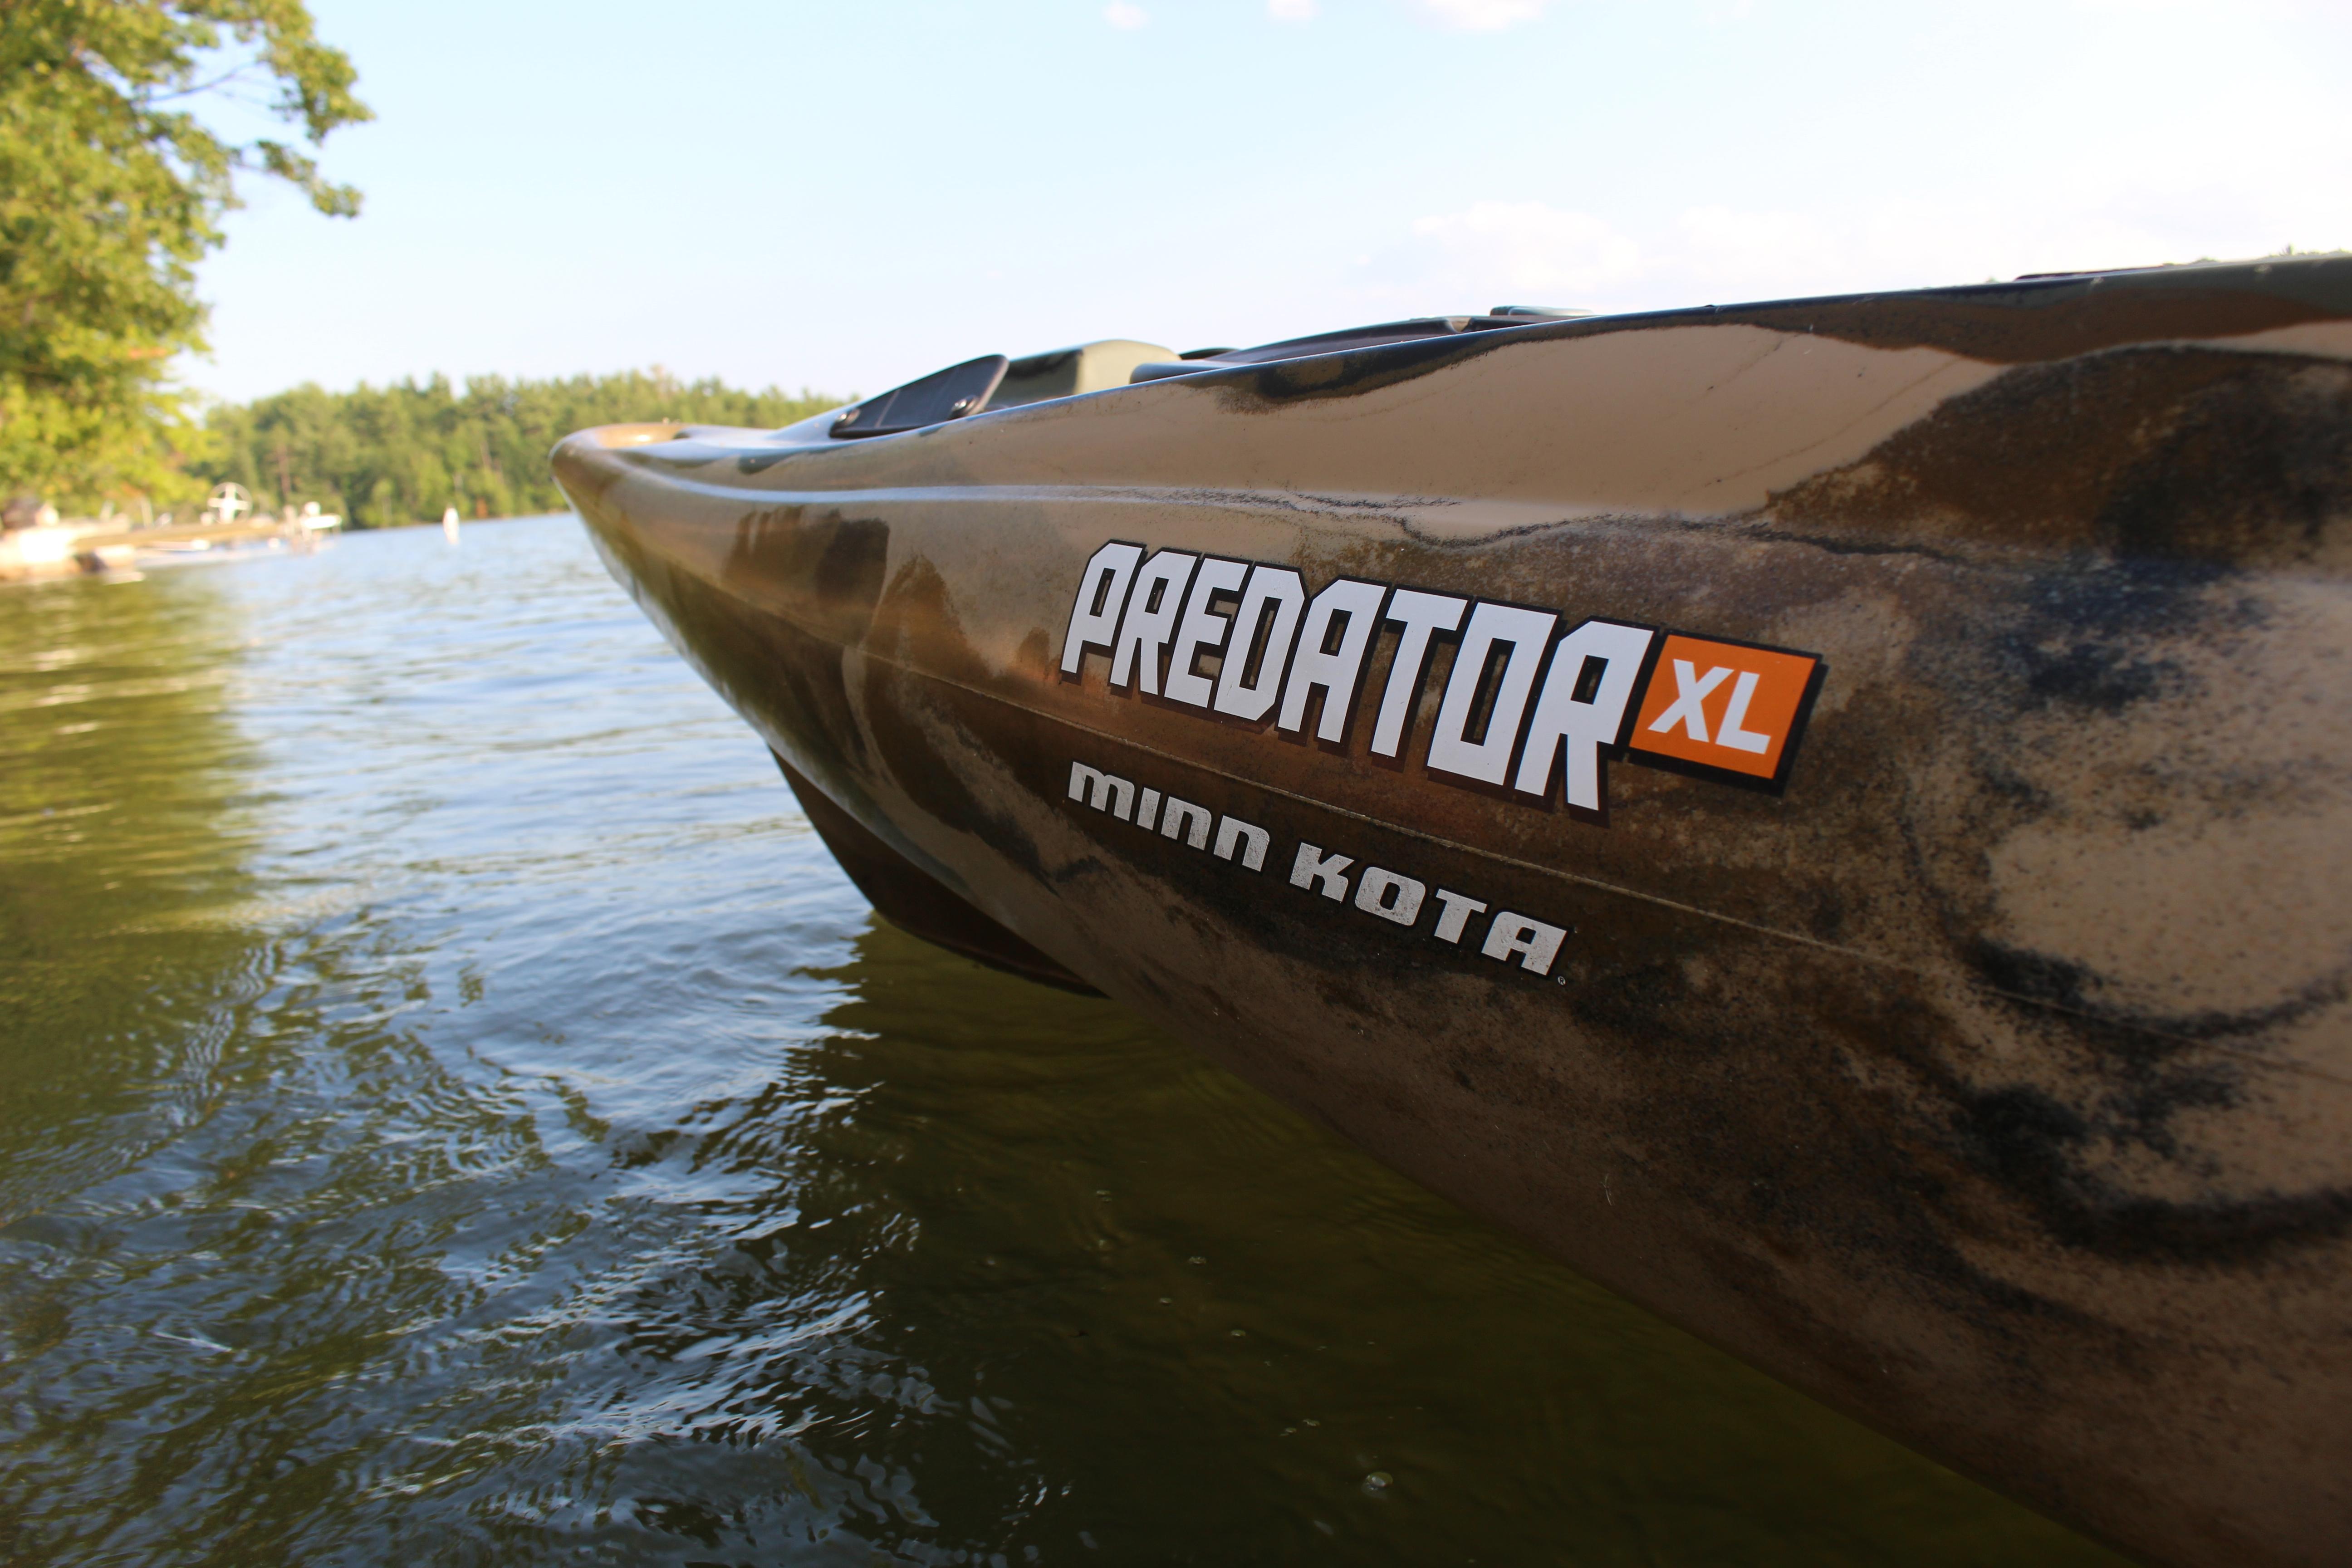 Predator xl minn kota kayak review busted wallet for Cabela s advanced angler 120 trolling motor